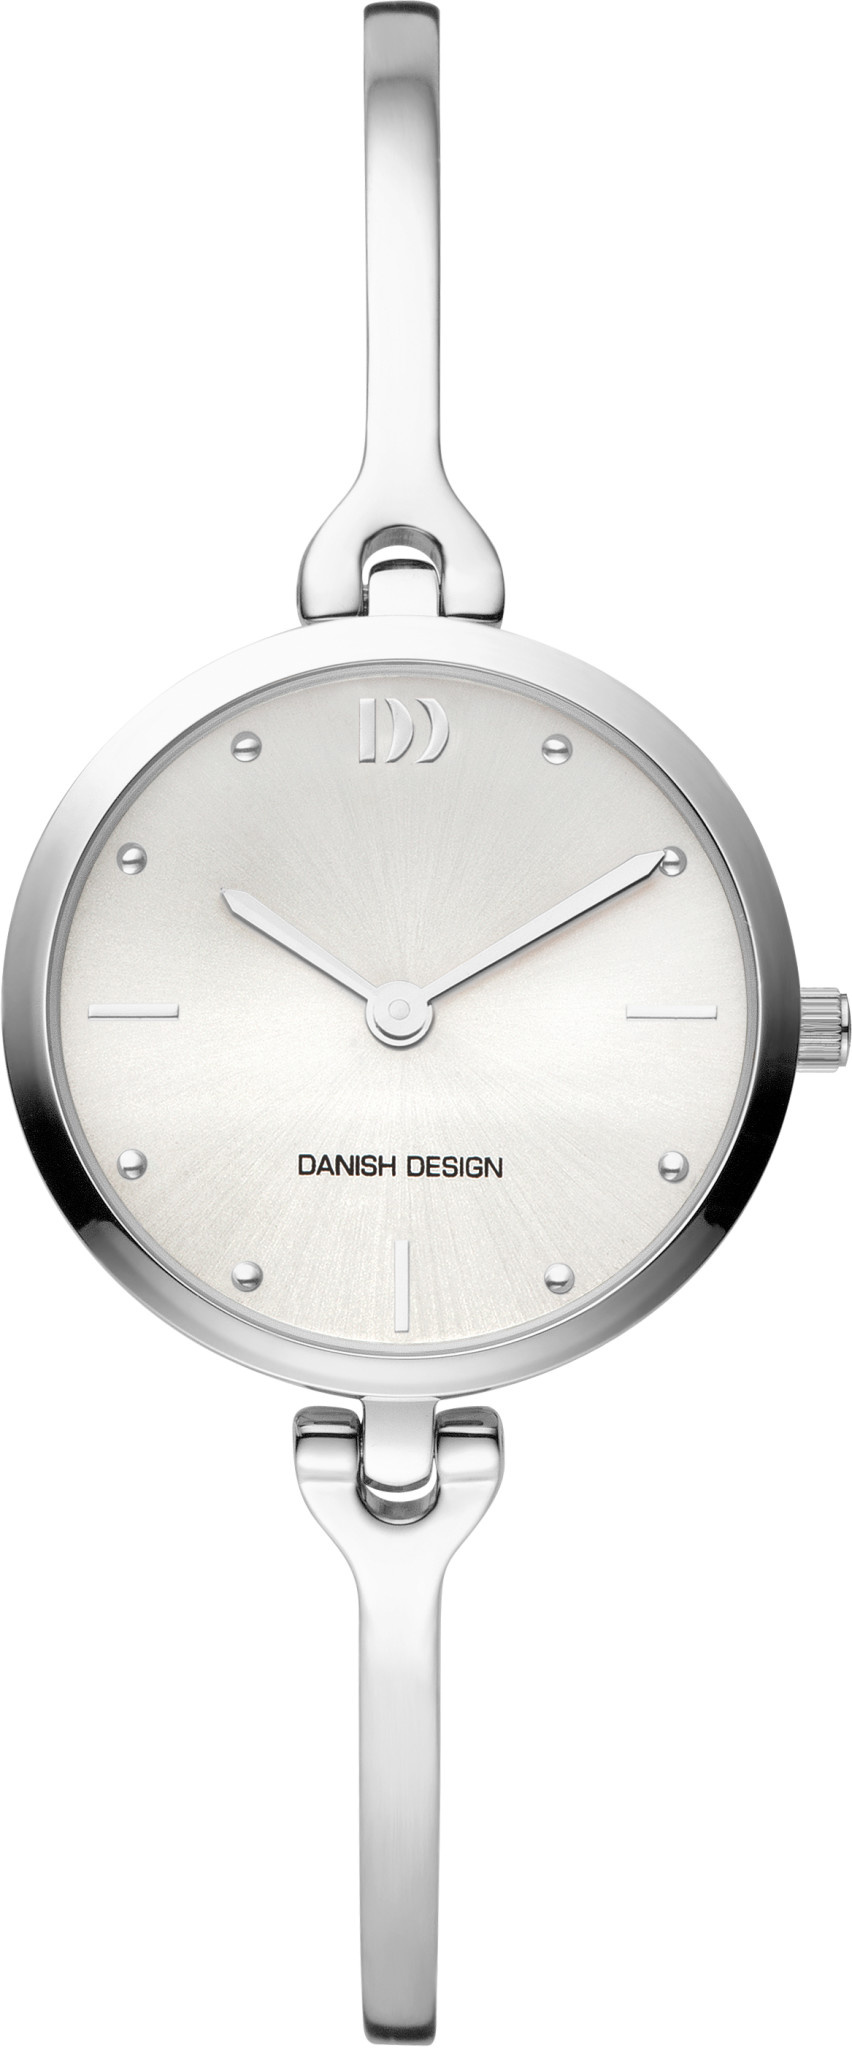 Danish Design Stainless Steel Watch Iv62Q1140,-2